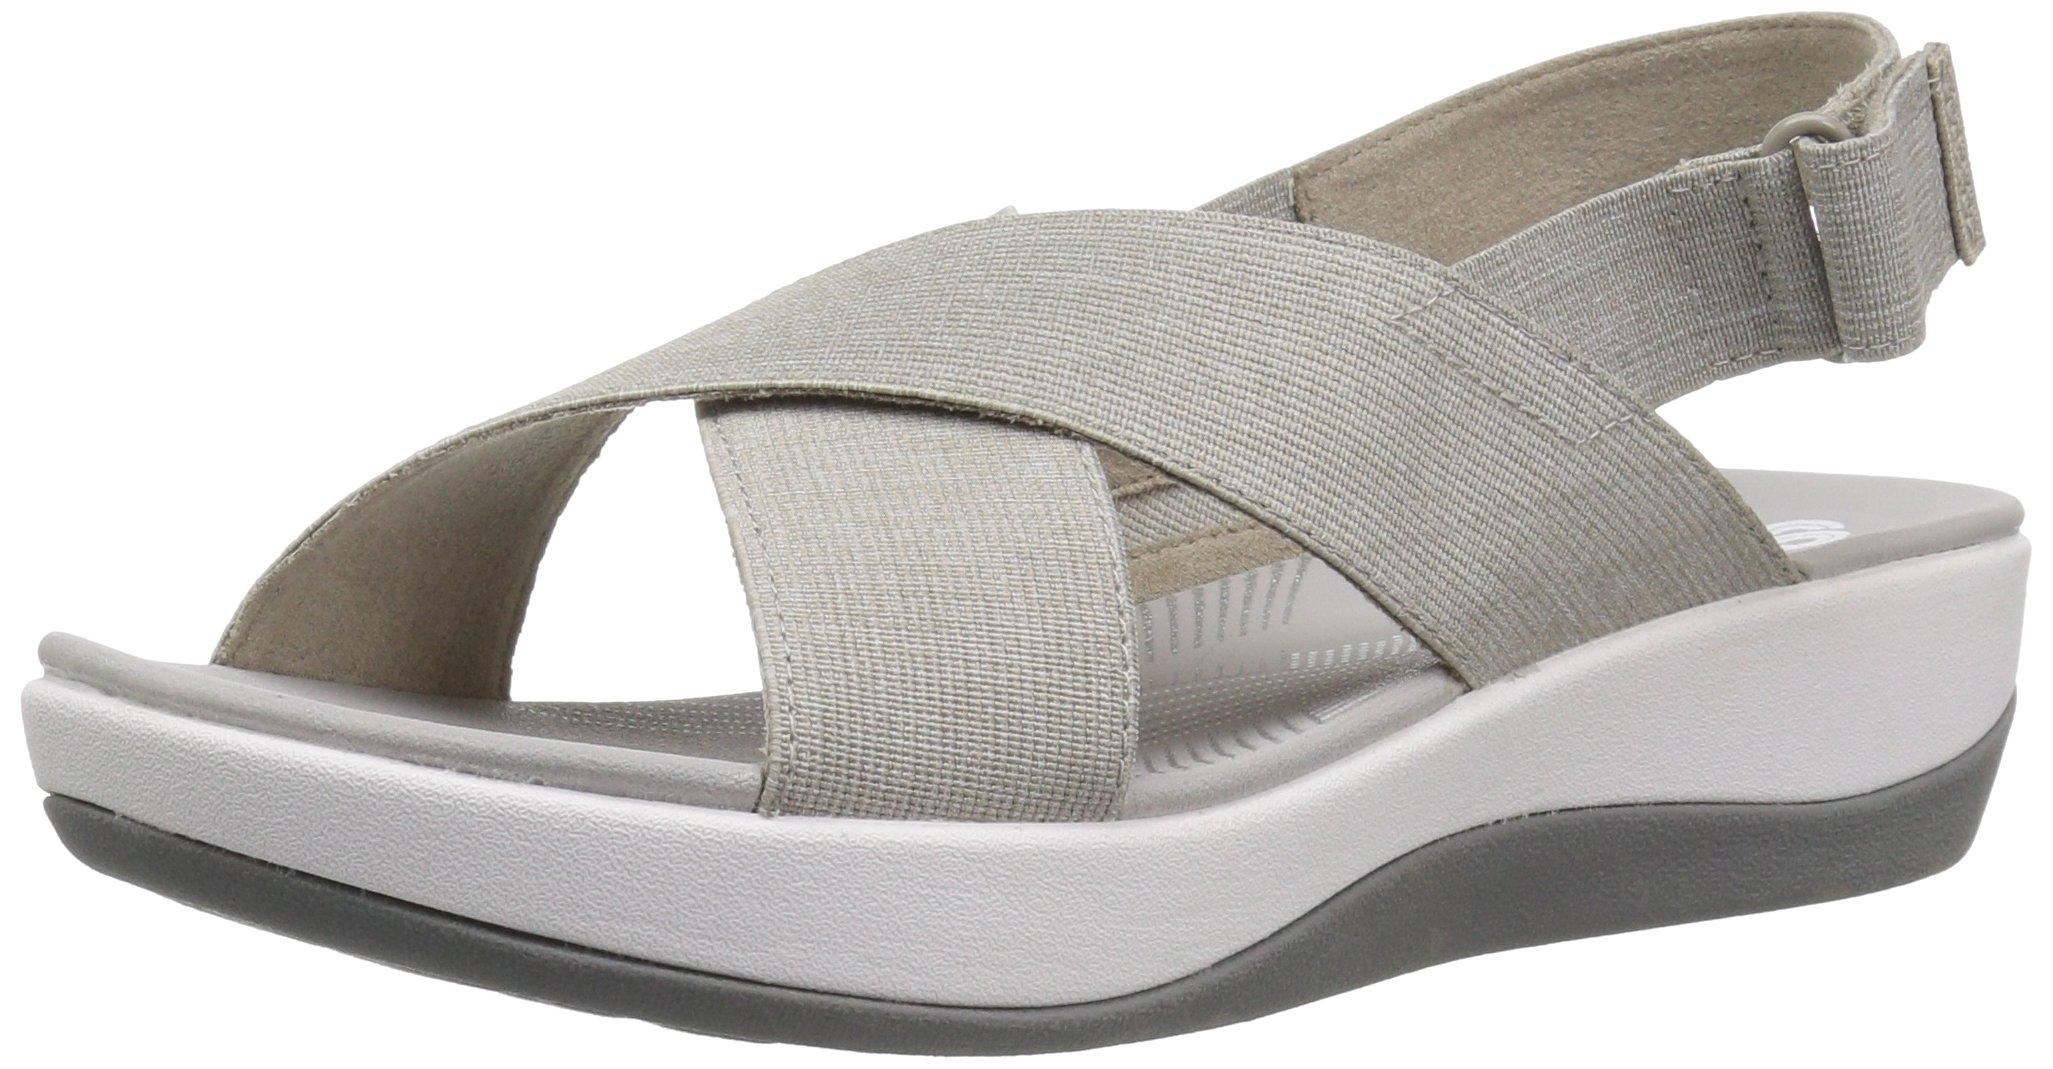 CLARKS Women's Arla Kaydin Sandal, Sand/White Heathered Elastic, 9 Wide US by CLARKS (Image #1)